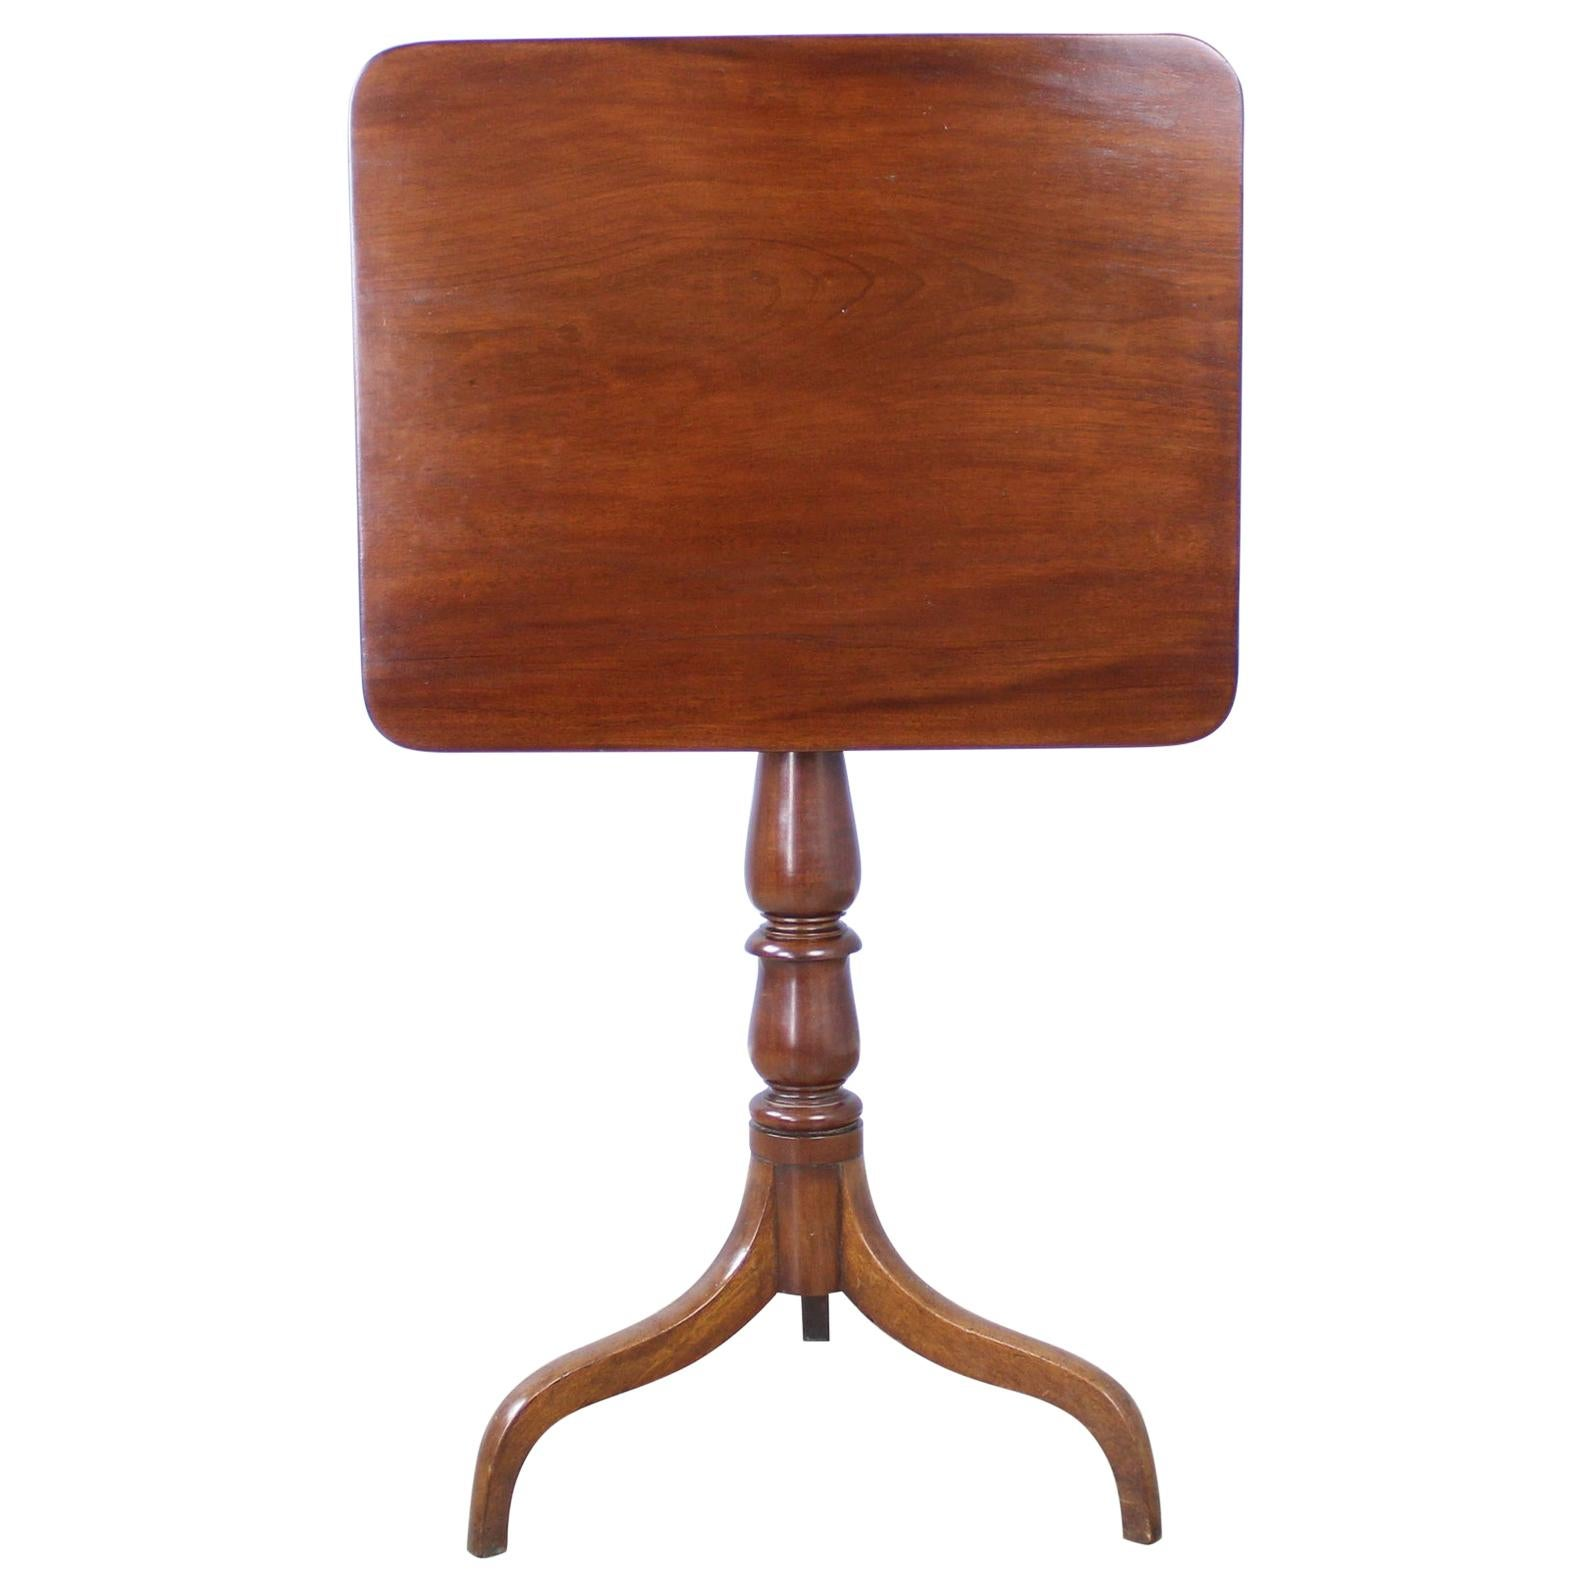 Early Georgian Mahogany Tilt-Top Pedestal Table